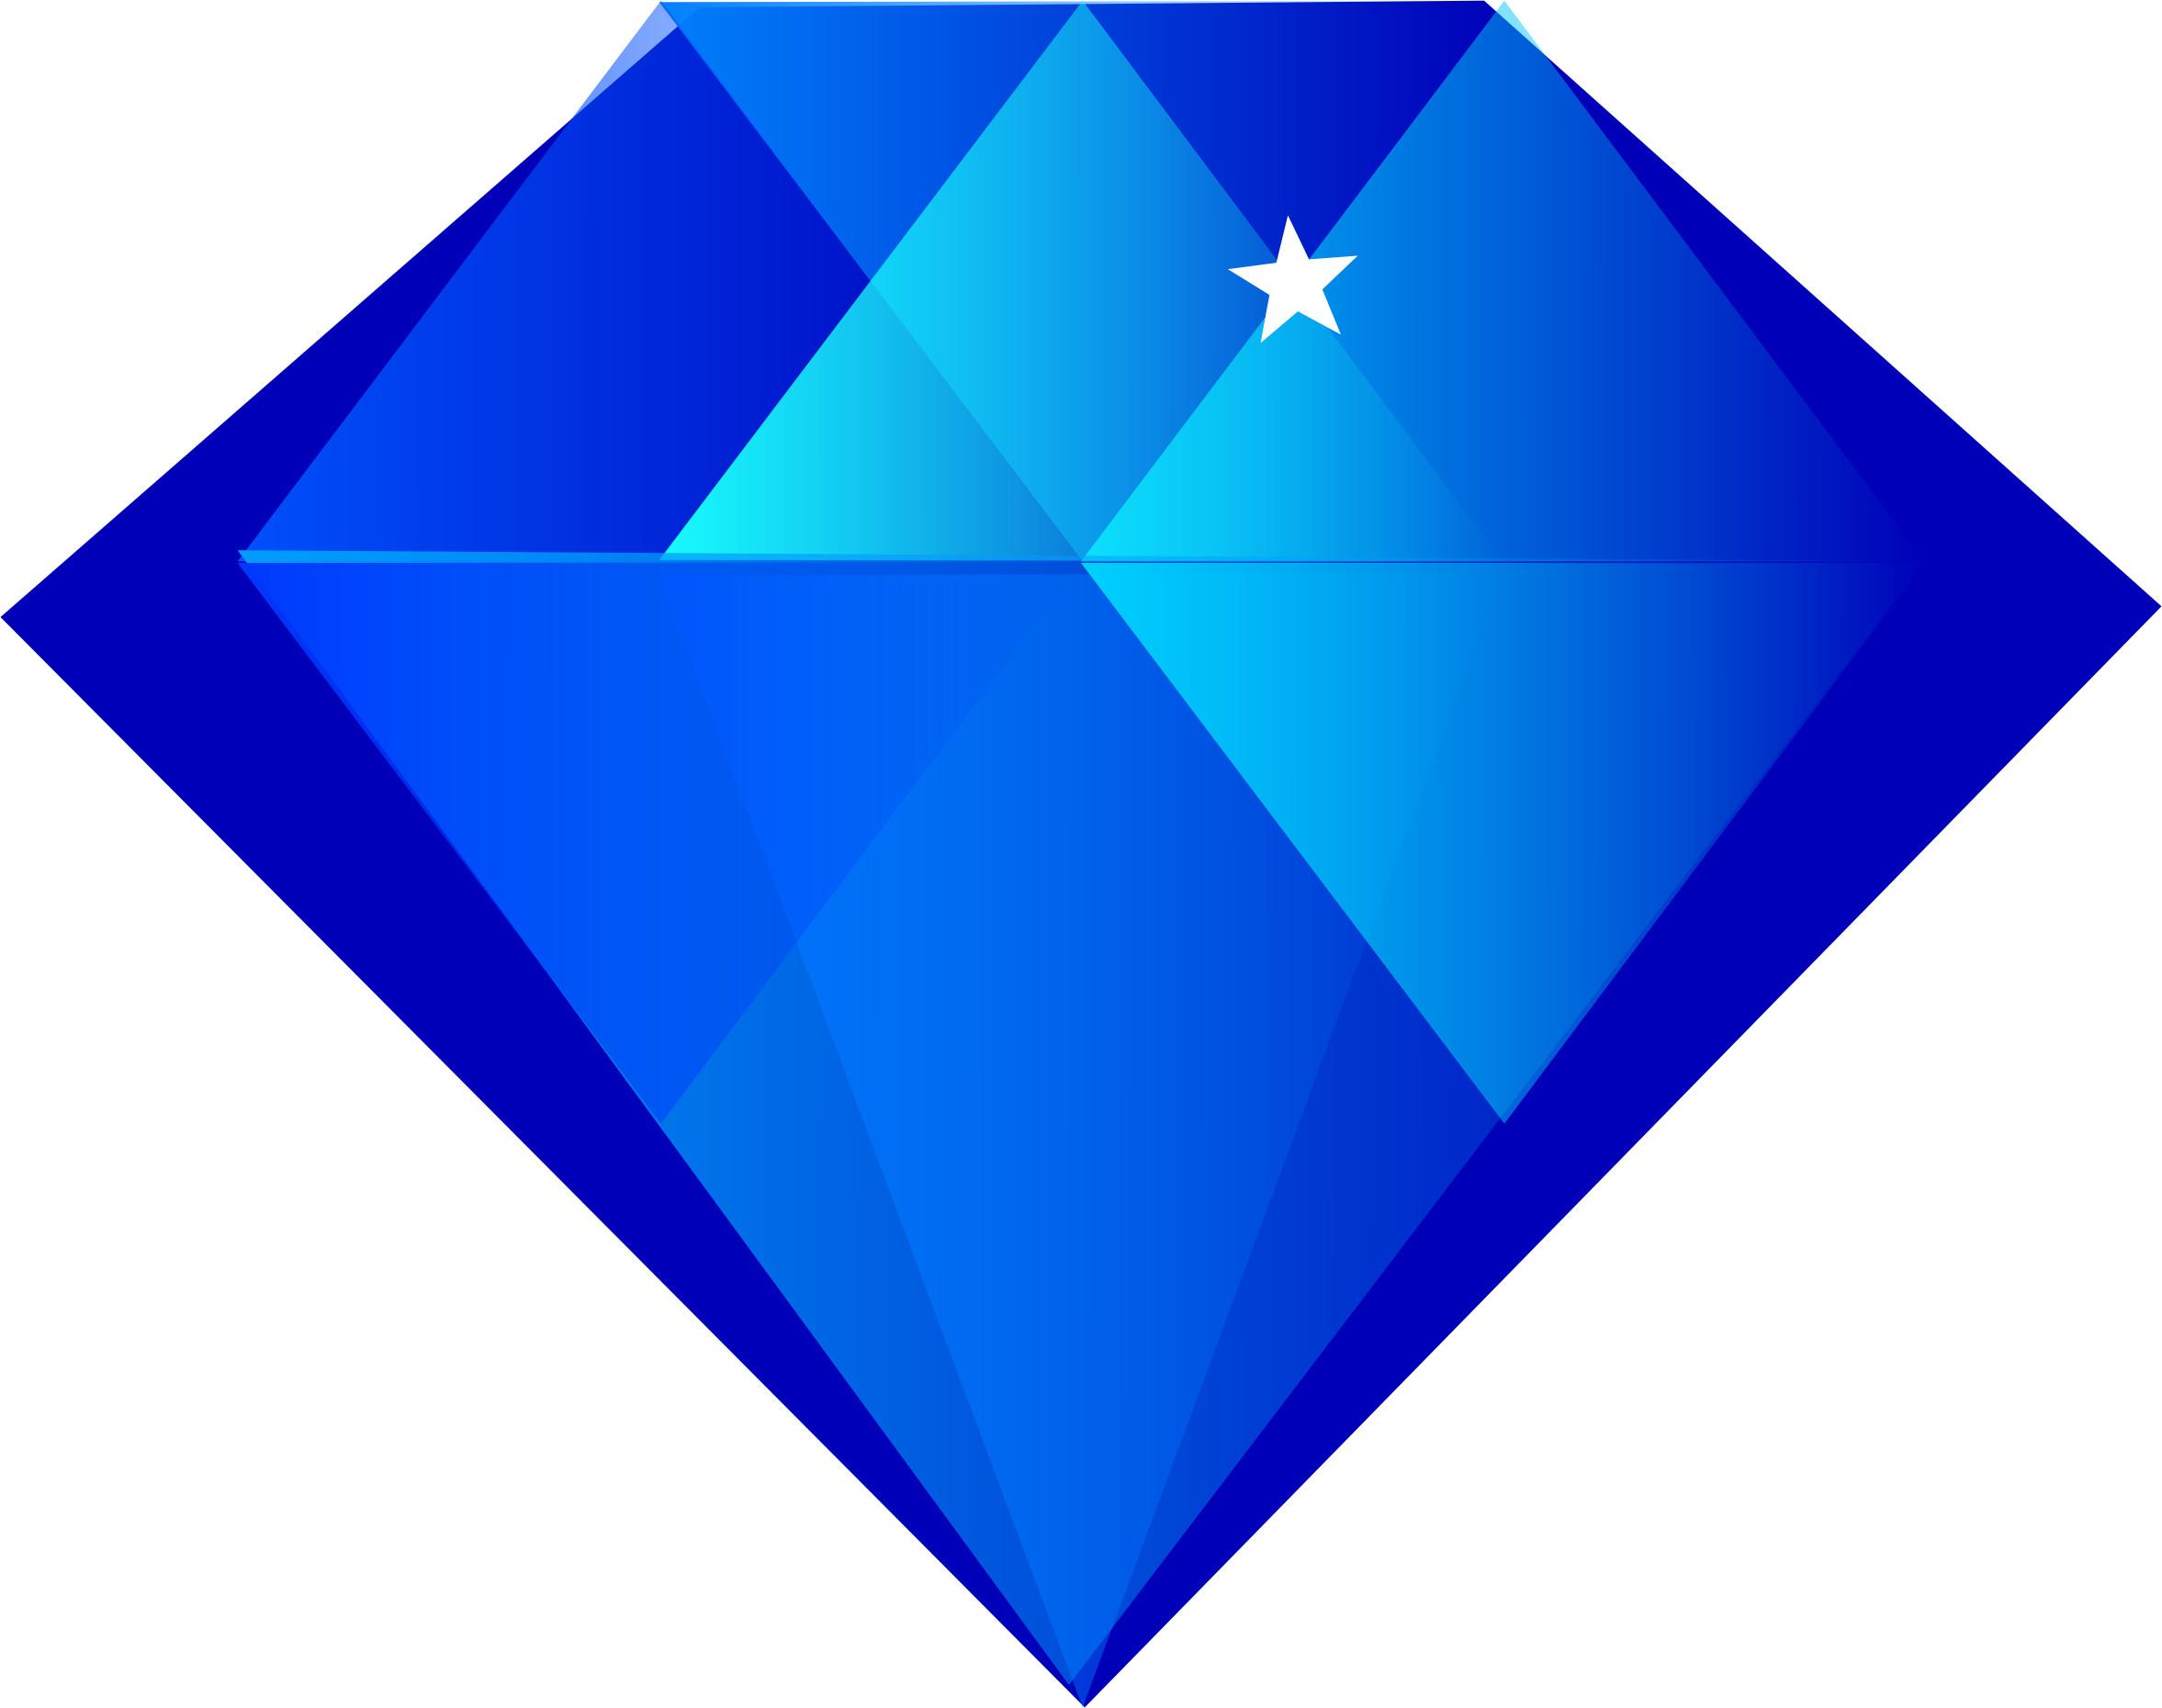 Diamond Shape Wallpaper (56+ images)